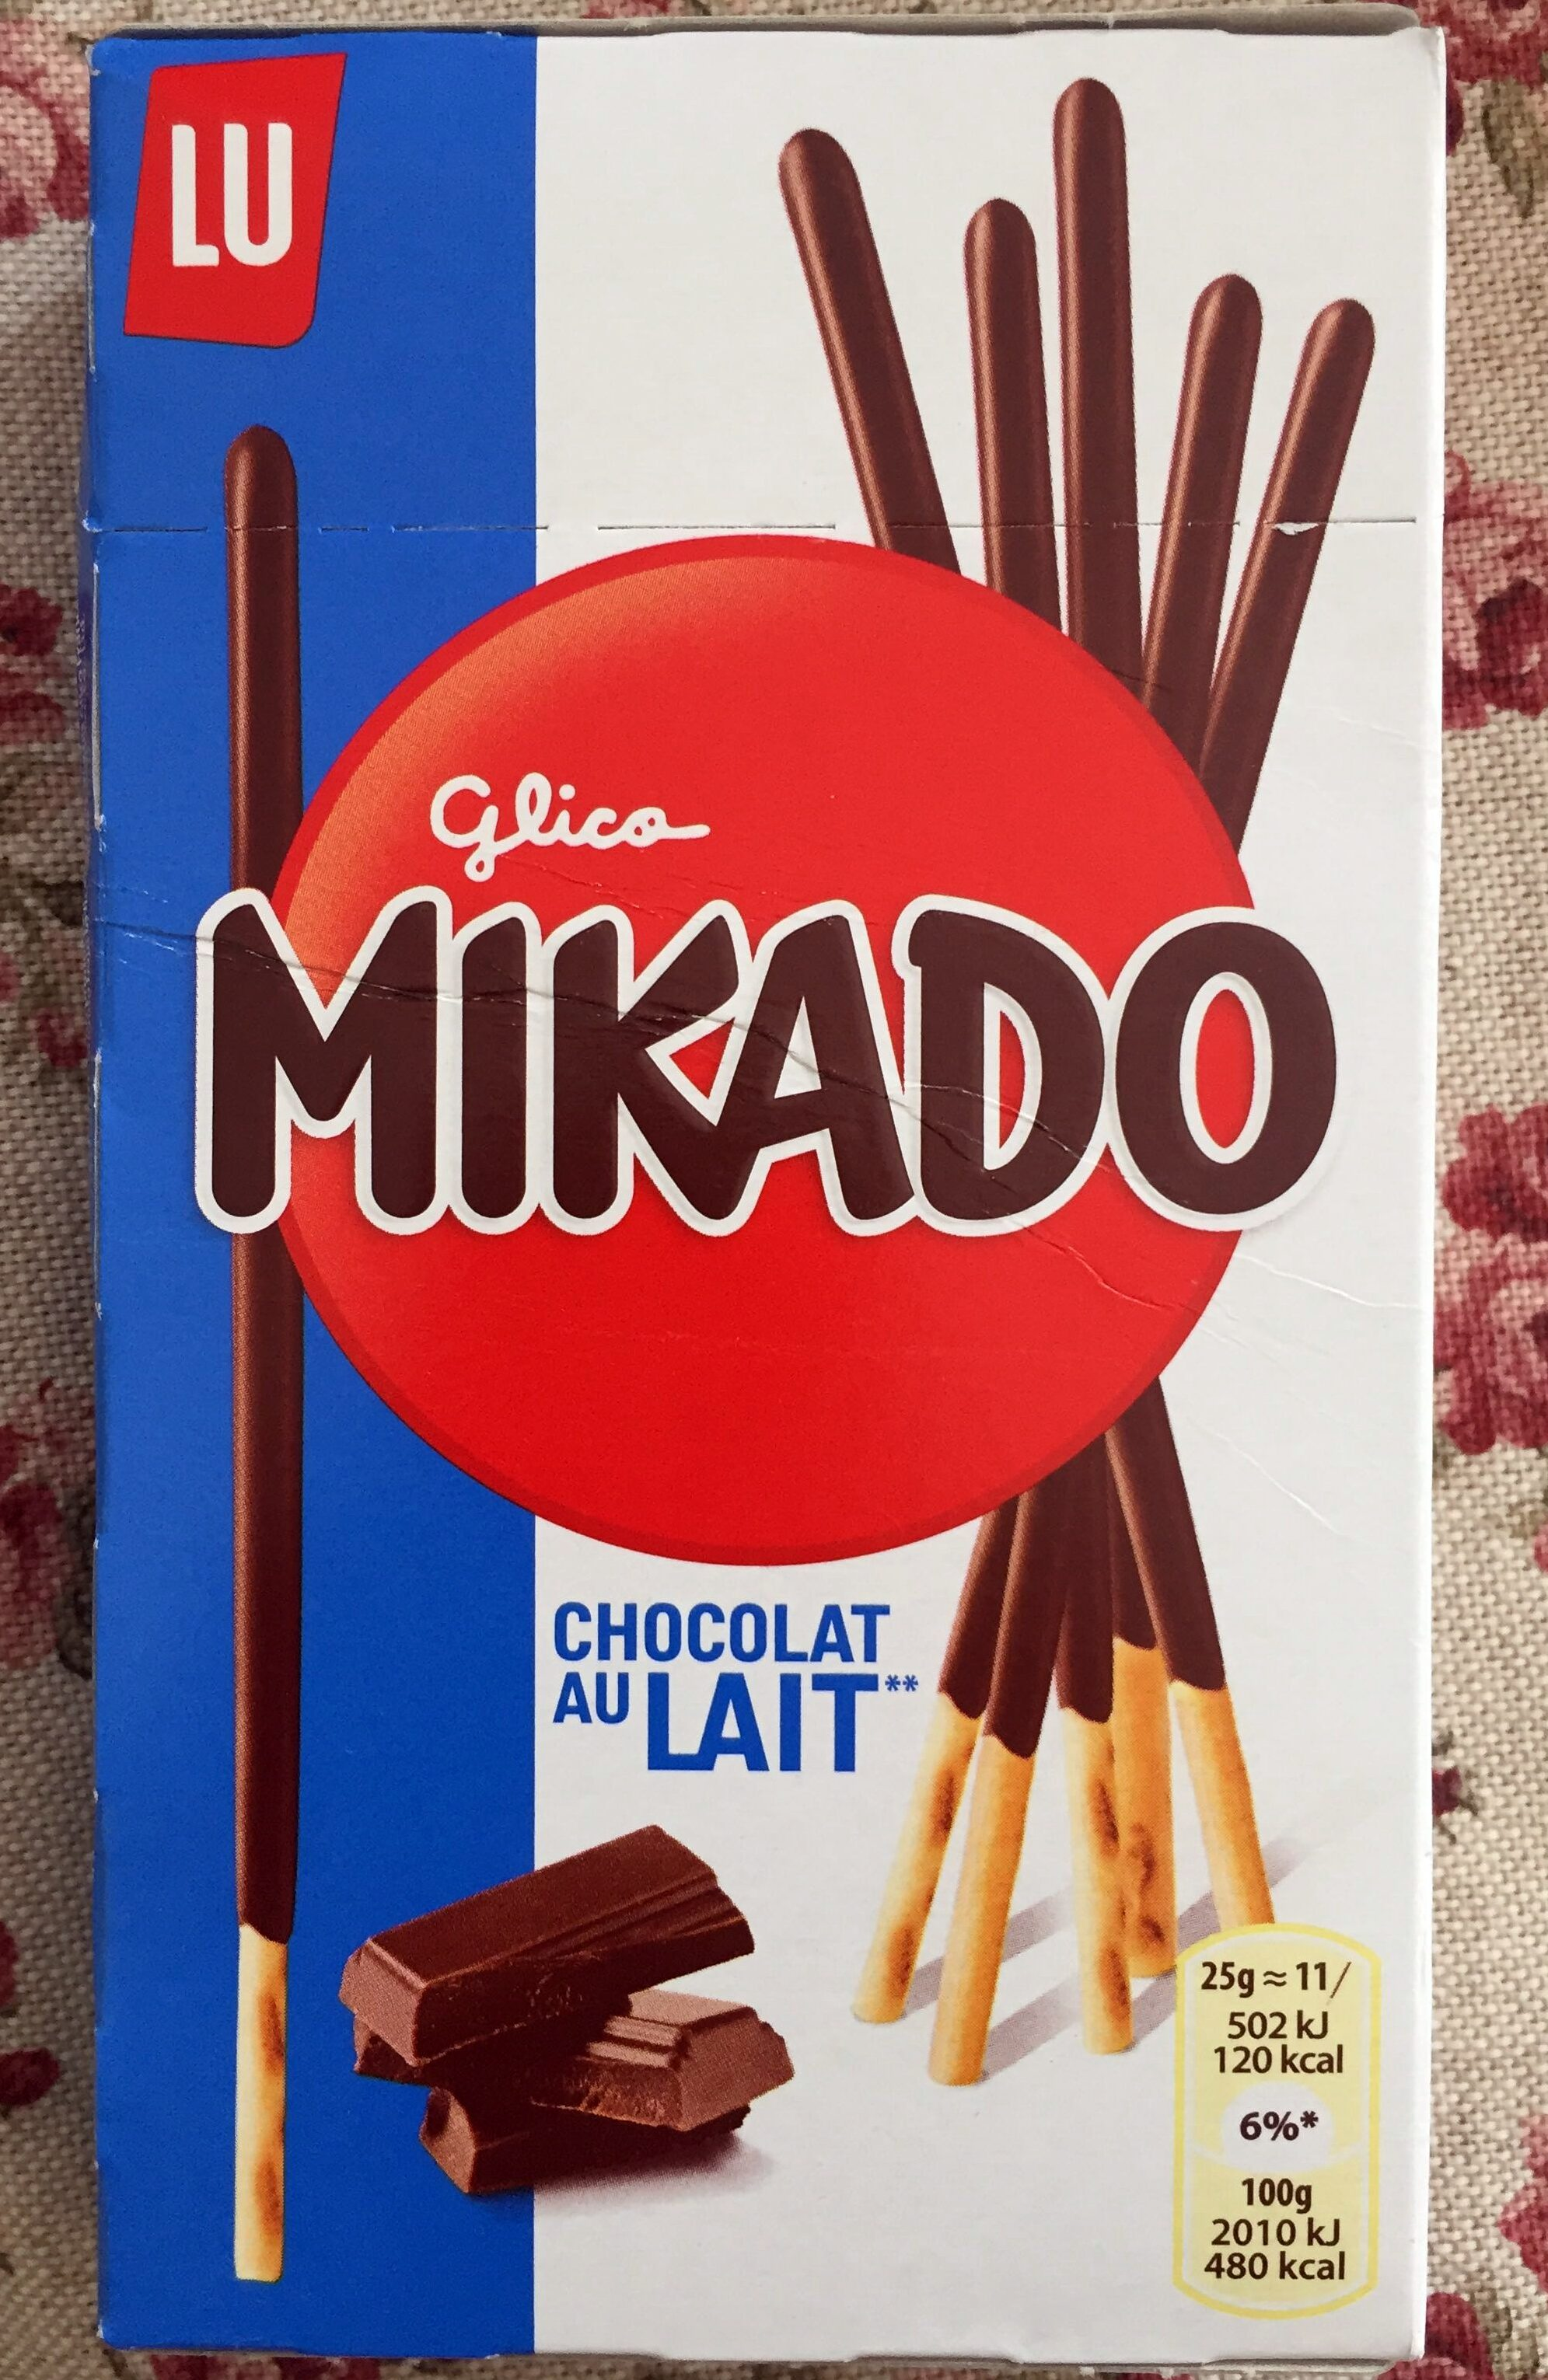 Mikado chocolat au lait - Producto - es